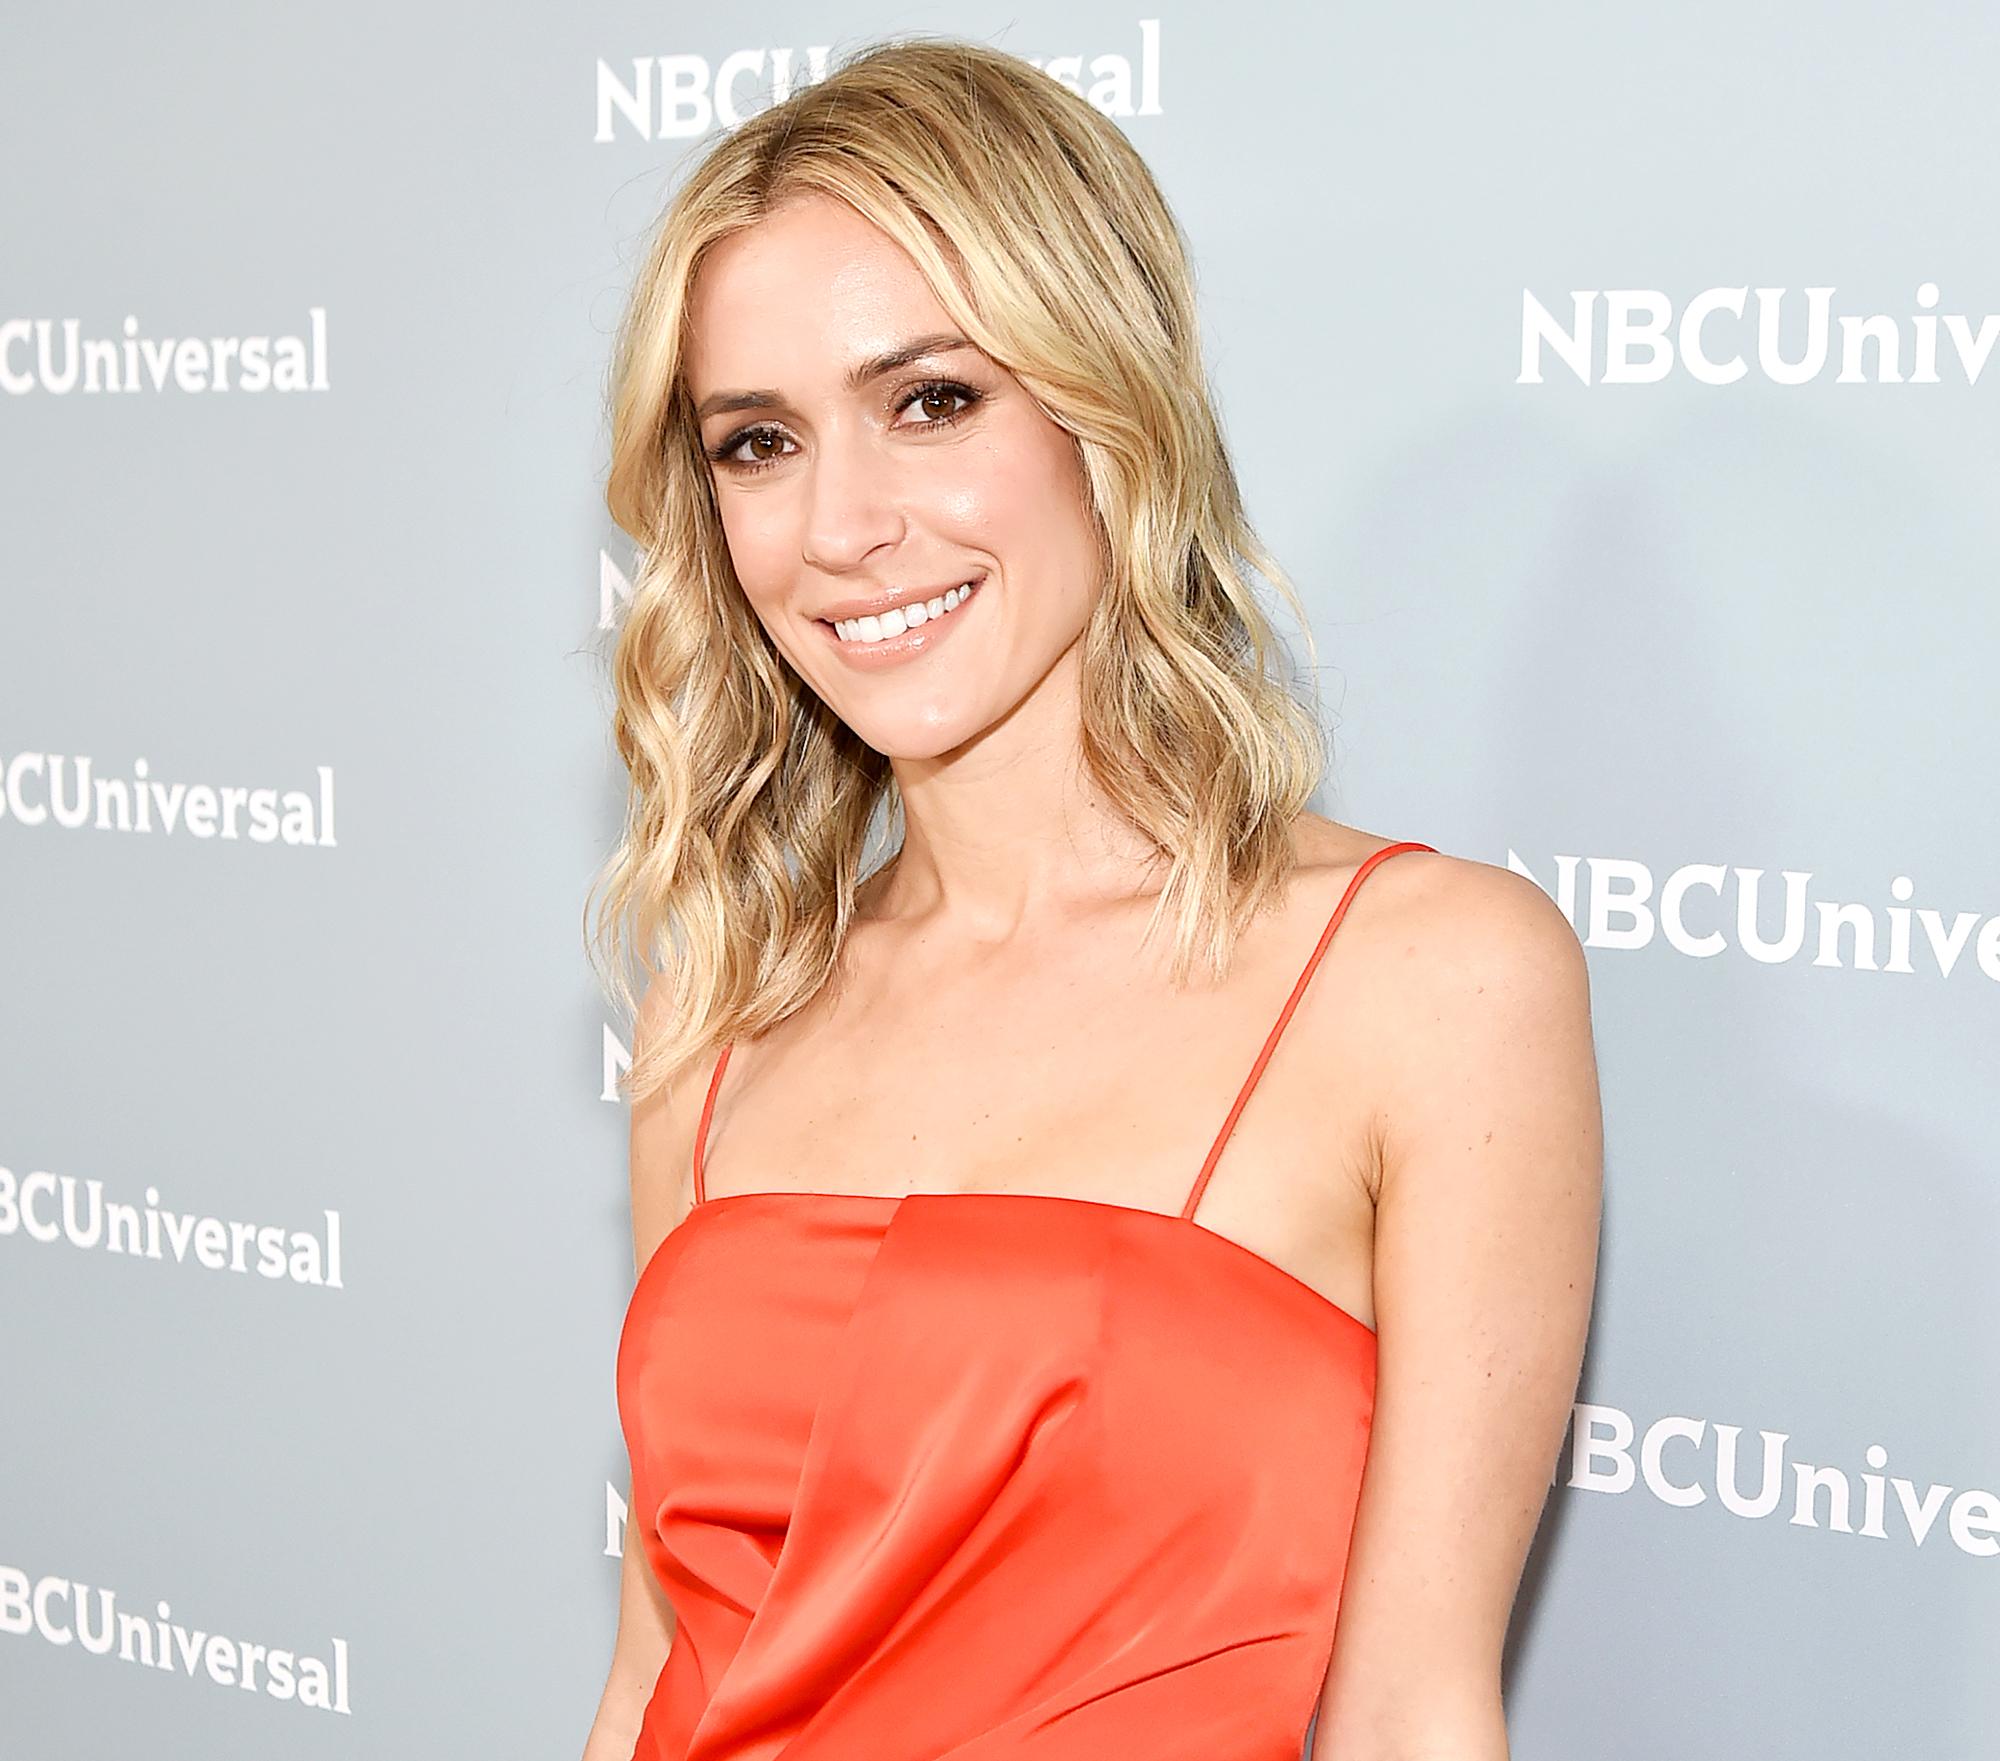 Kristin-Cavallari-NBC-upfront-orange-dress